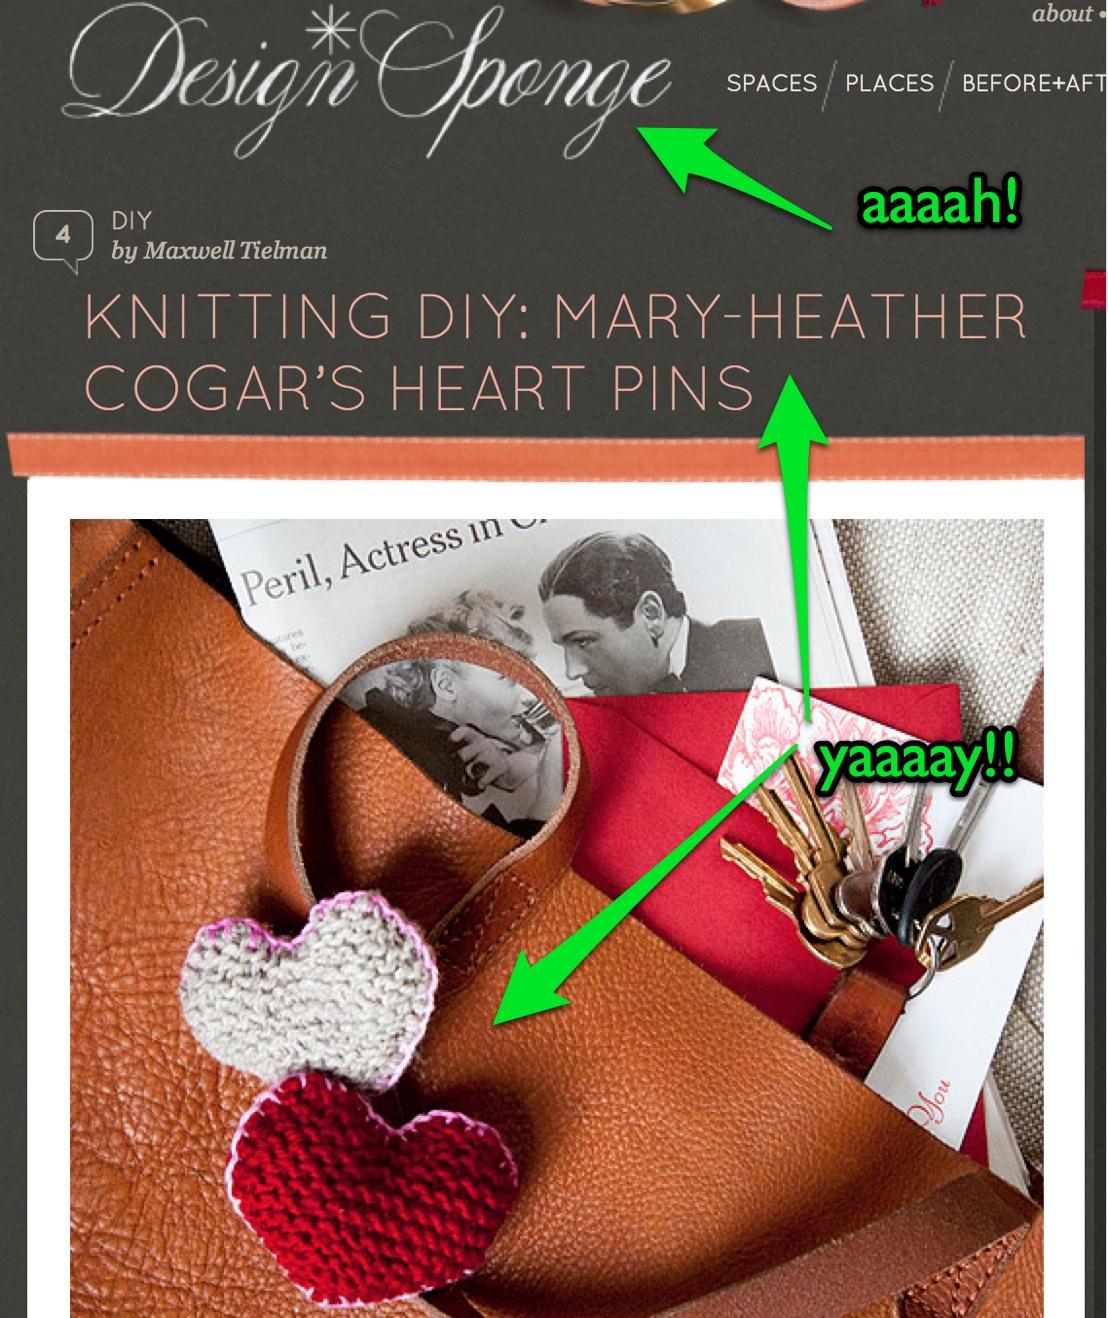 Knitting DIY_ Mary-Heather Cogar's Heart Pins | Design*Sponge-1.jpg